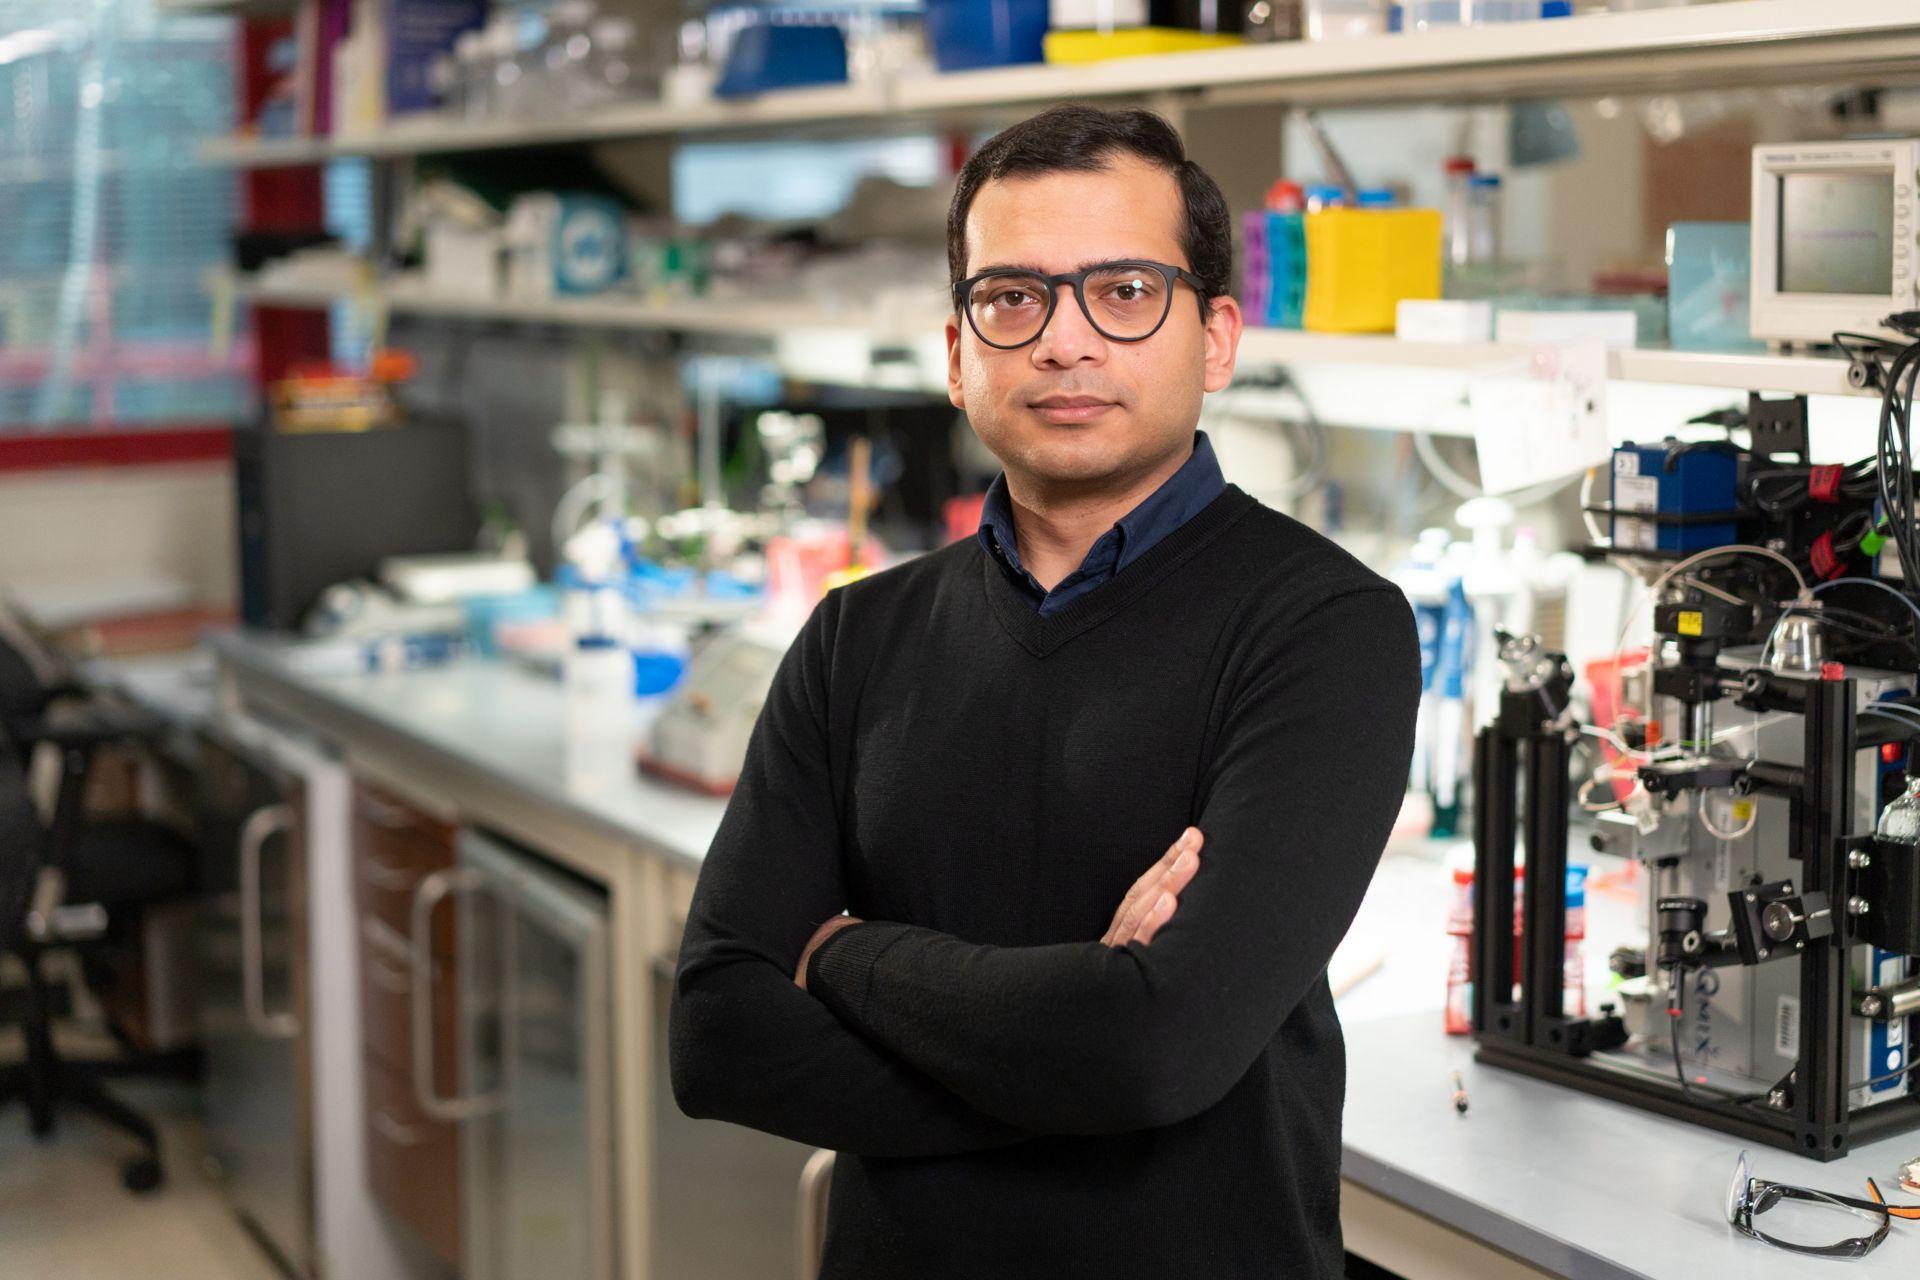 Anustup Poddar, PhD